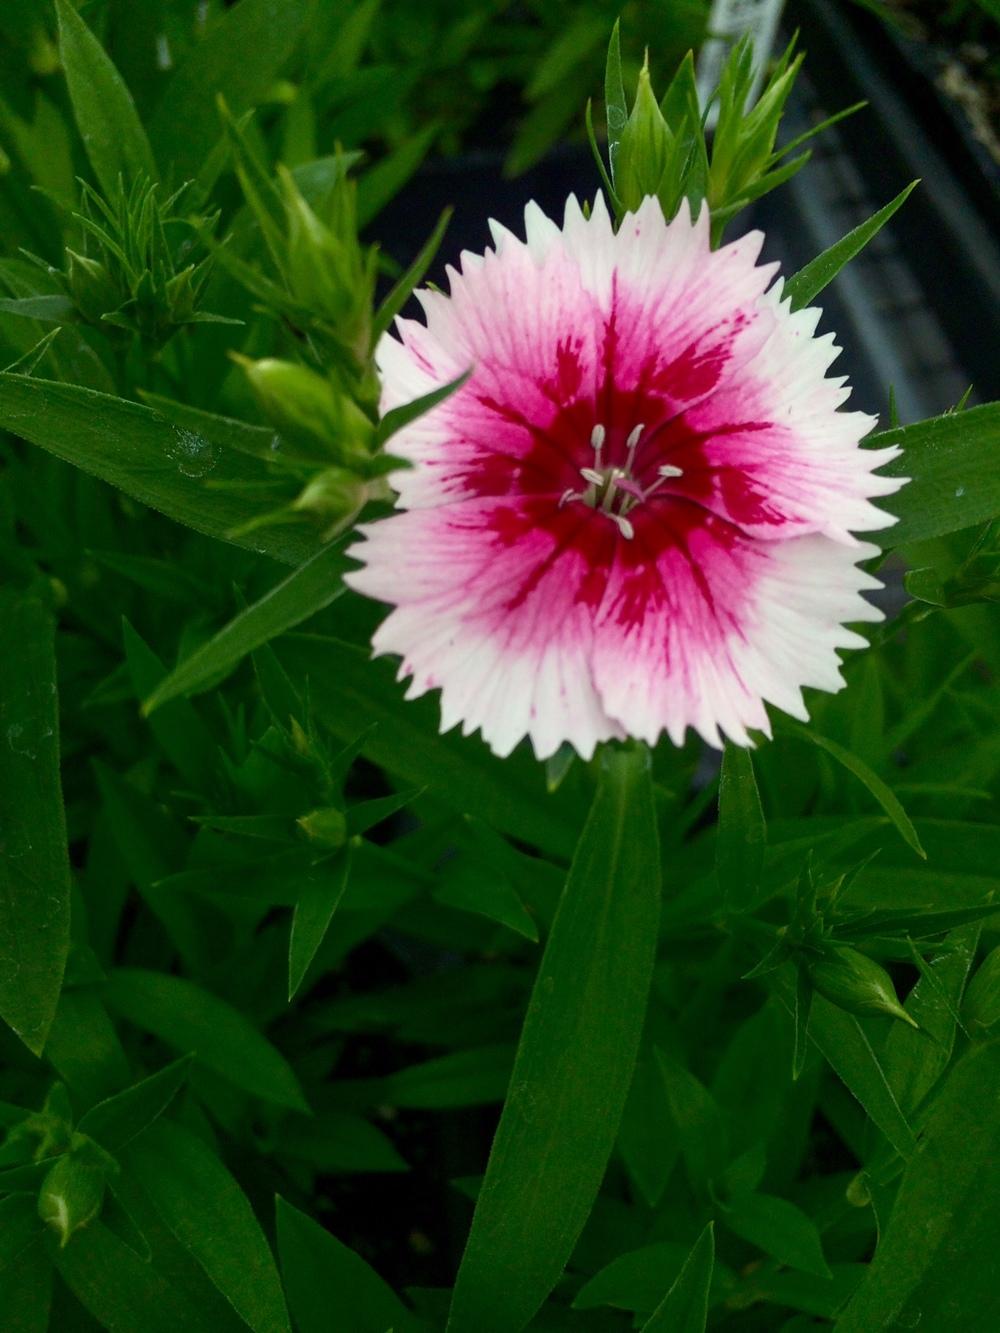 Early annuals edwards greenhouse bright daisy like flowers full sun 24 tall izmirmasajfo